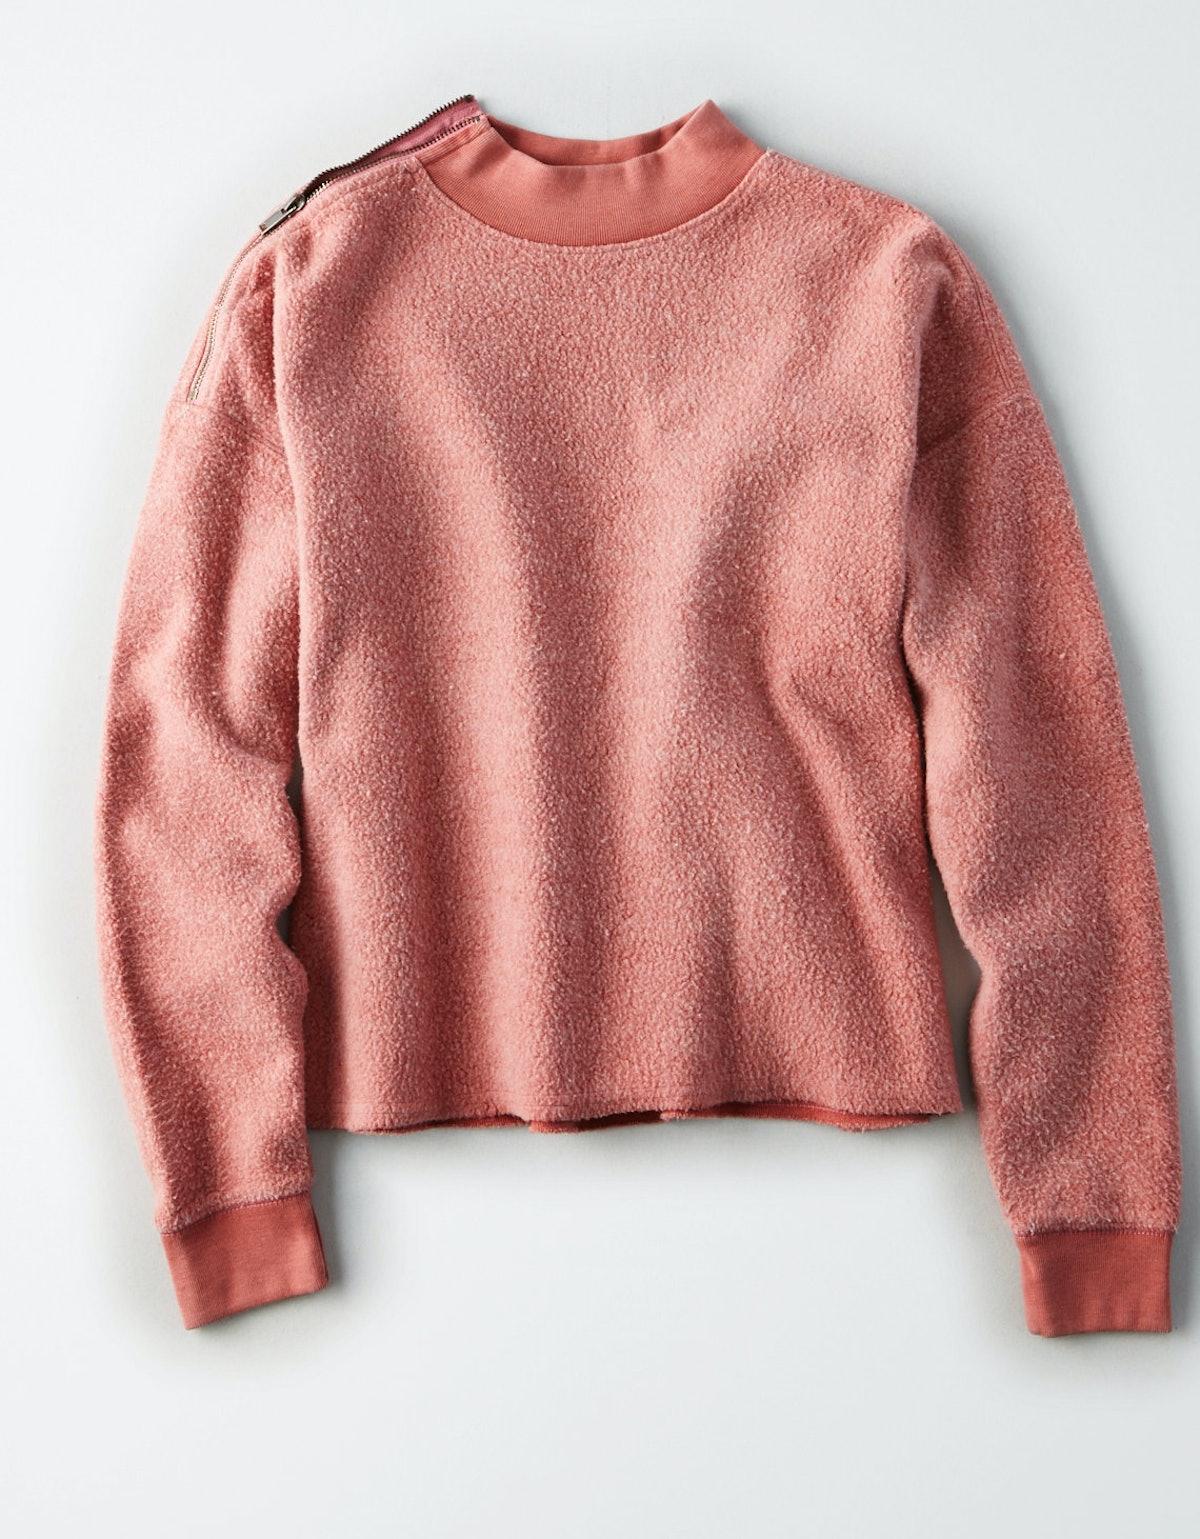 Inside Out Zip Shoulder Sweat Shirt